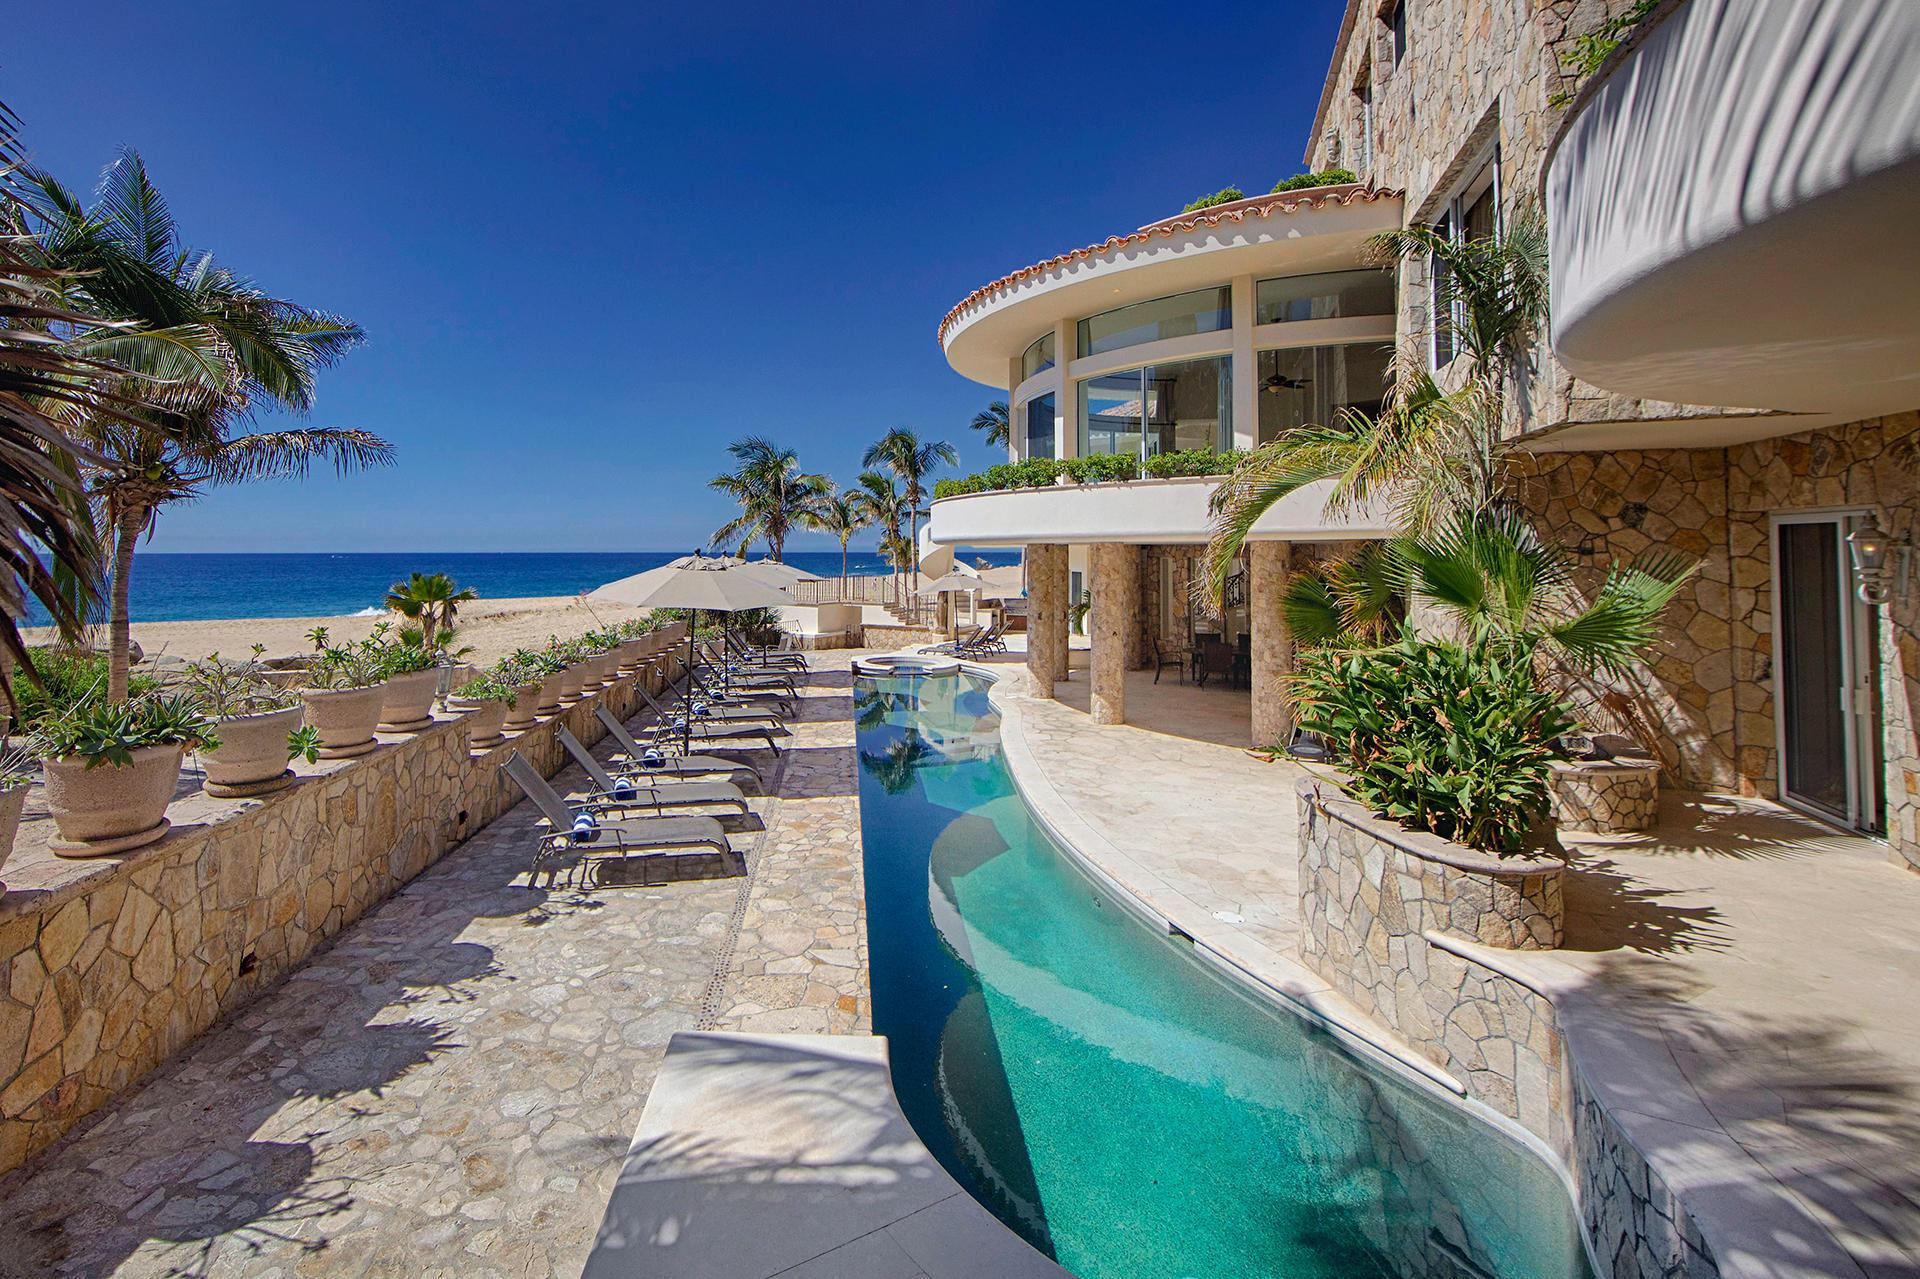 Pedregal, Cabo San Lucas